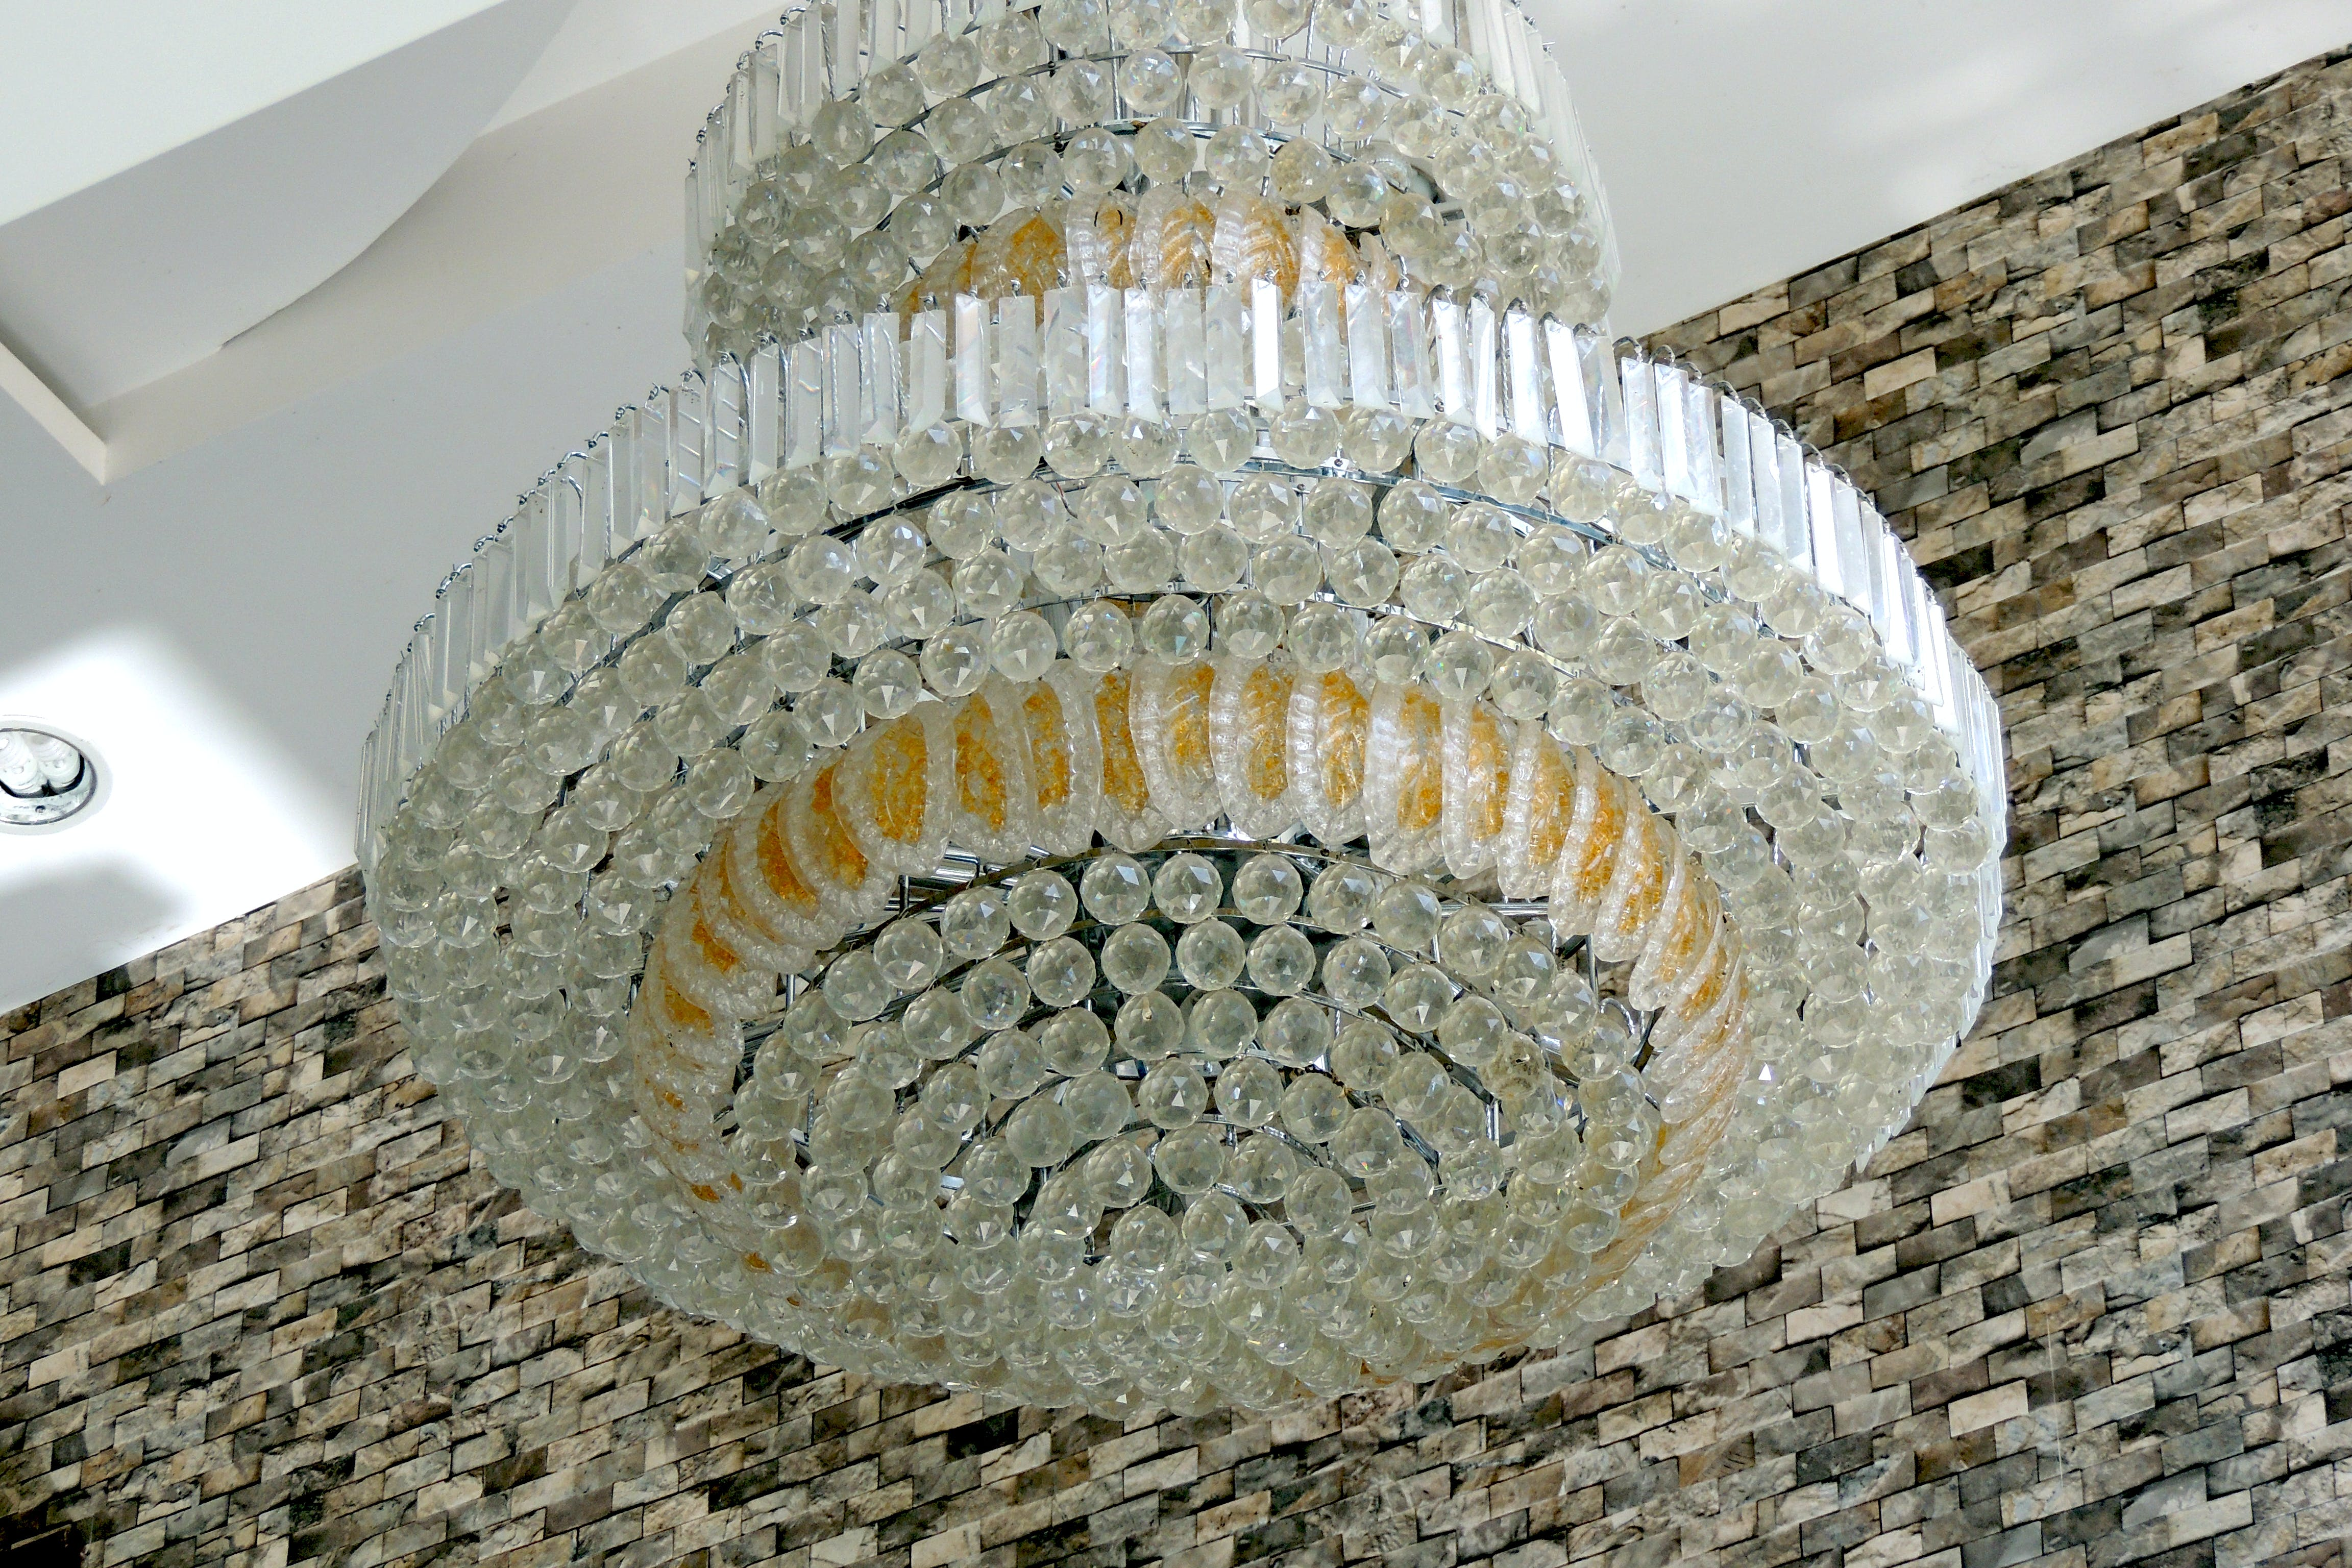 Kostenloses Stock Foto zu beleuchtung, hängen, kronleuchter, lampen